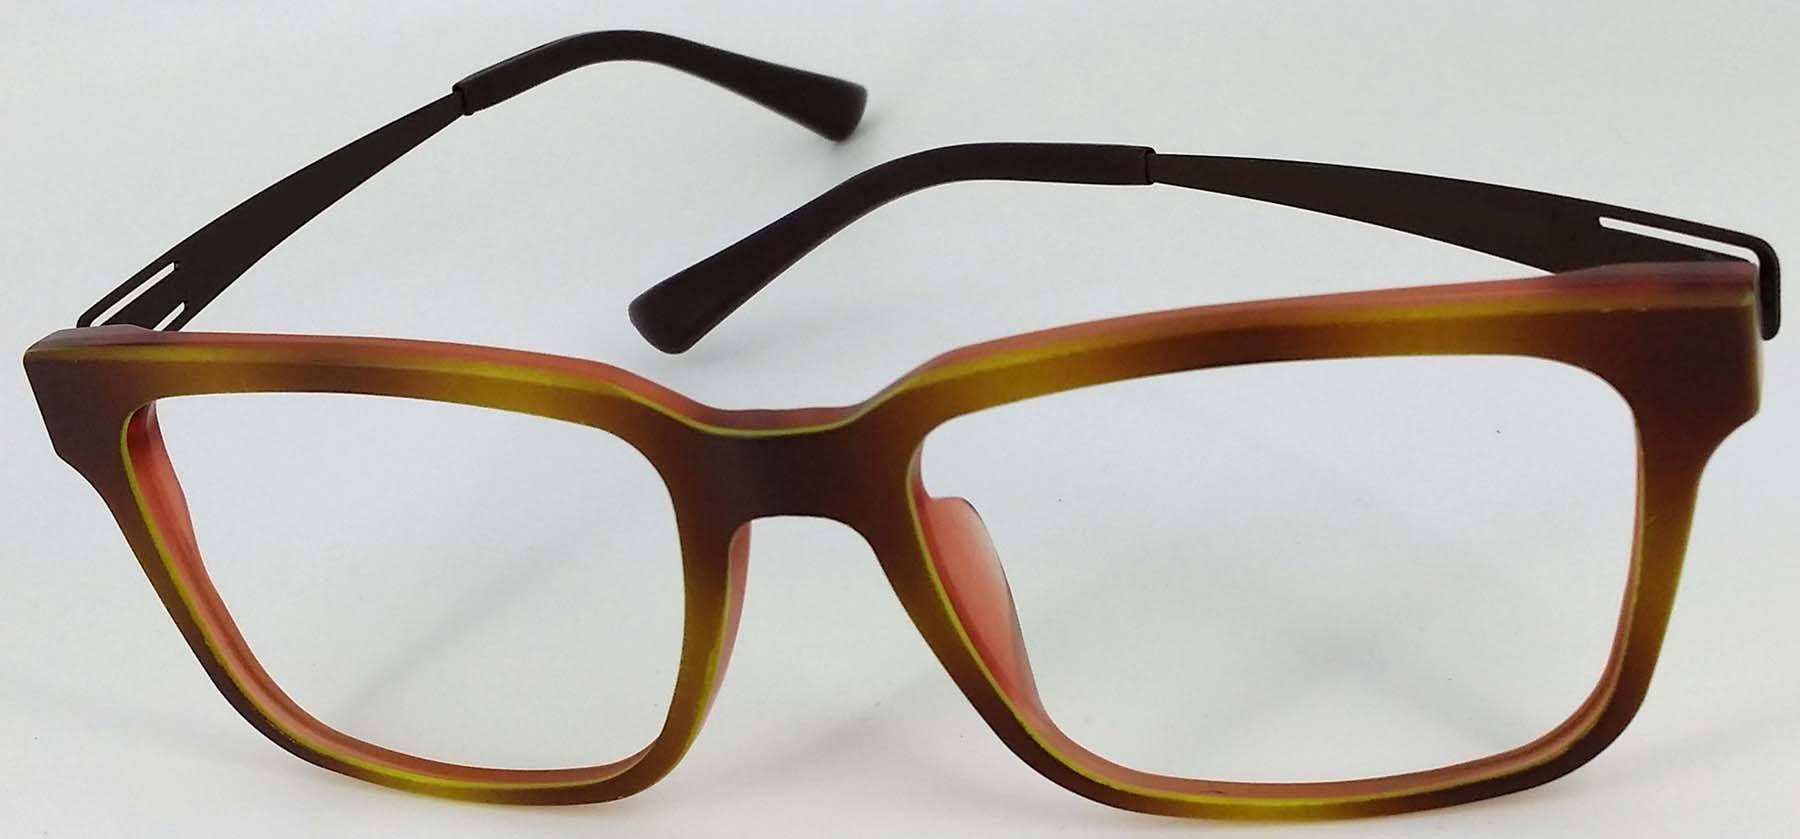 High-quality Eyeglasses frame